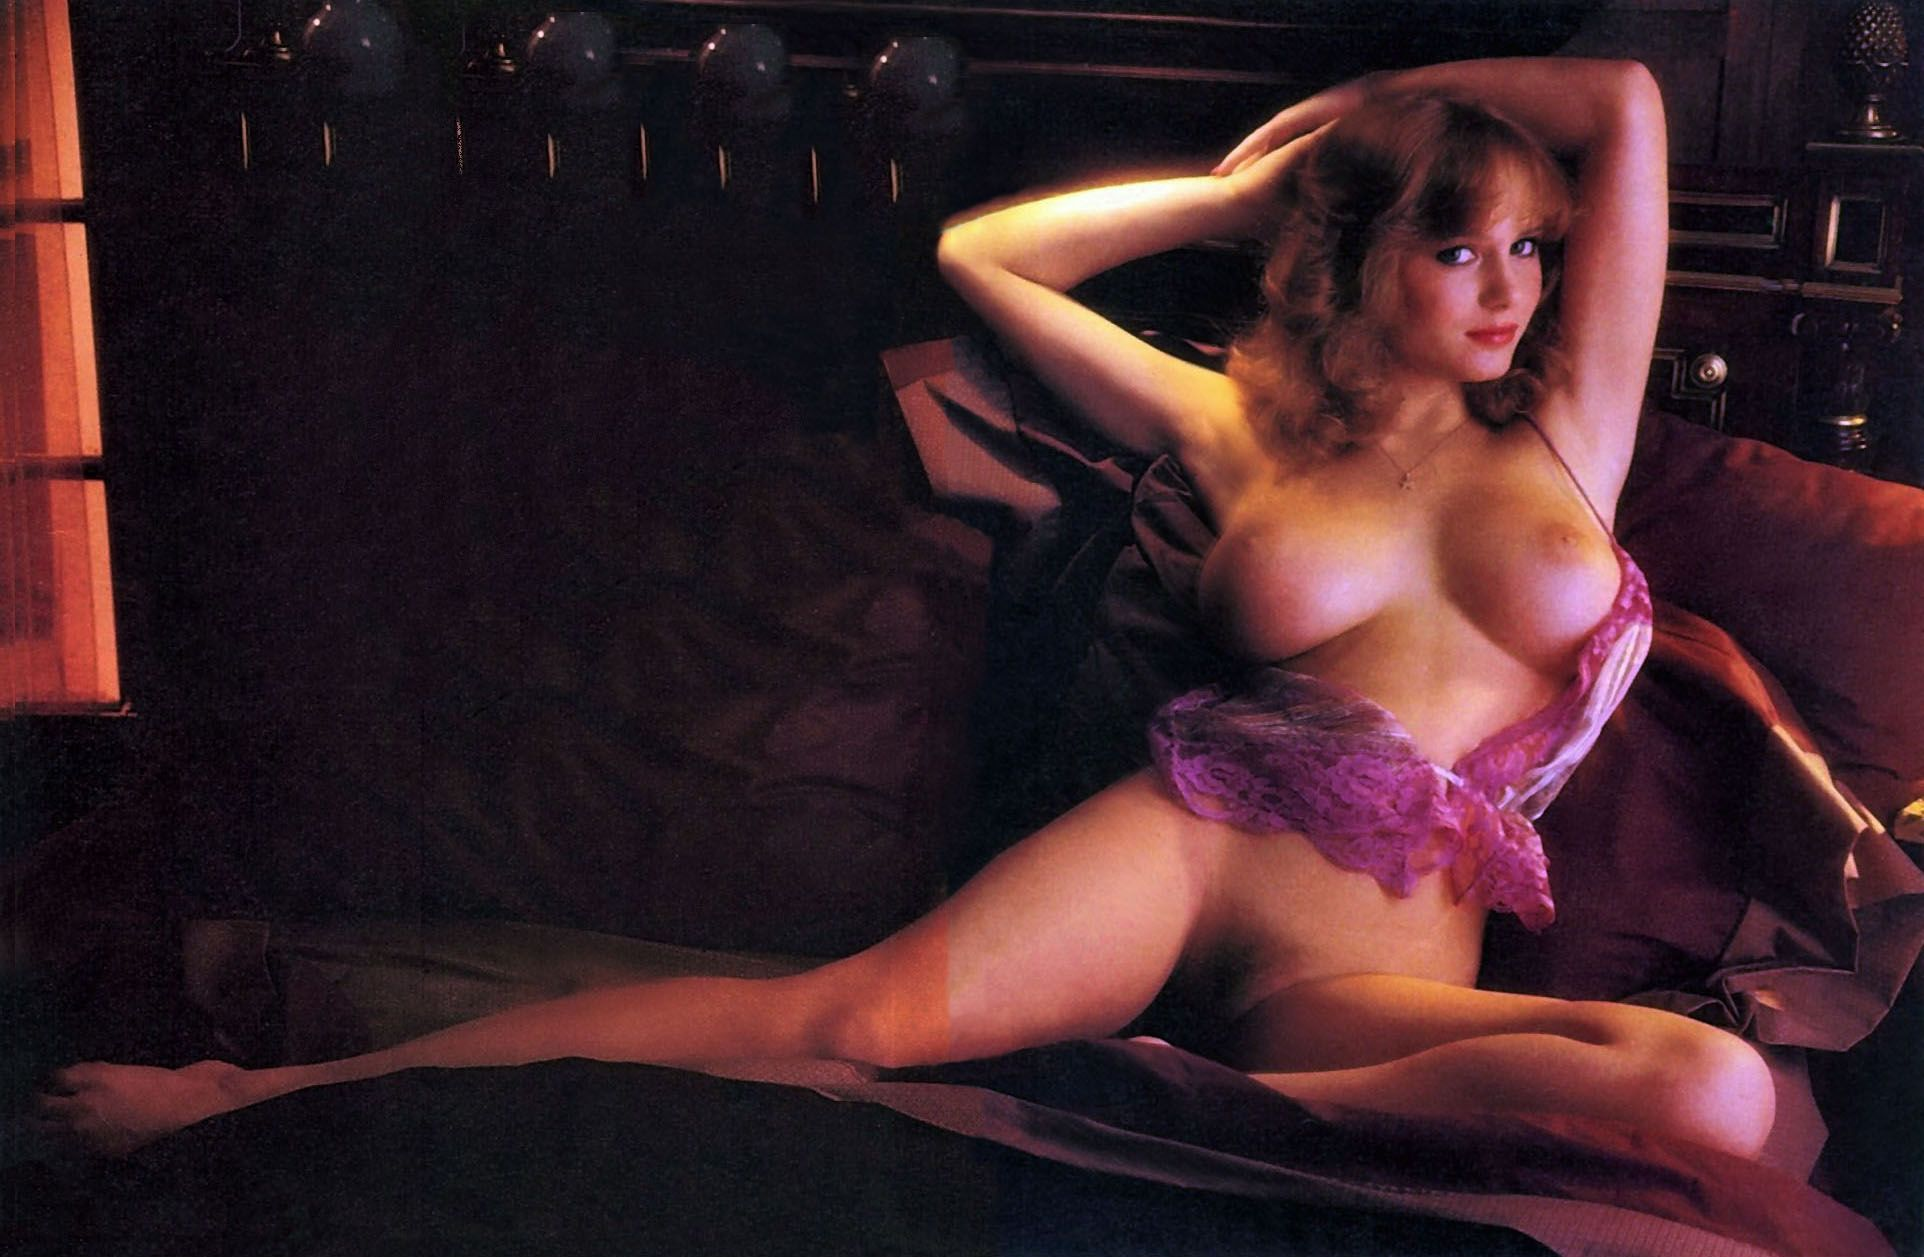 Lenka kripac nude topless alex vaughan topless too